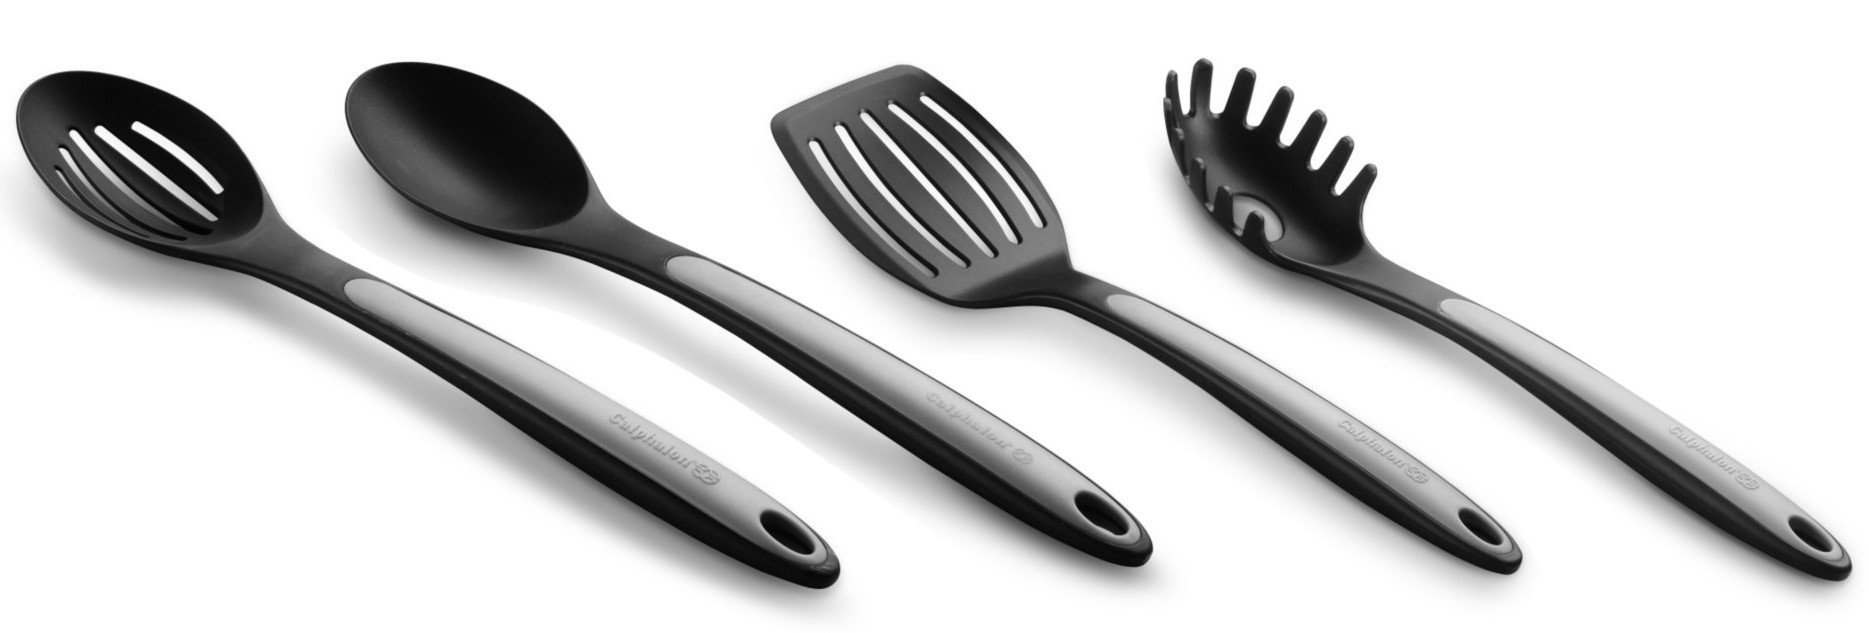 Calphalon Nylon Utensils Spoon, Slotted Spoon, Slotted Turner, Pasta Fork by Calphalon